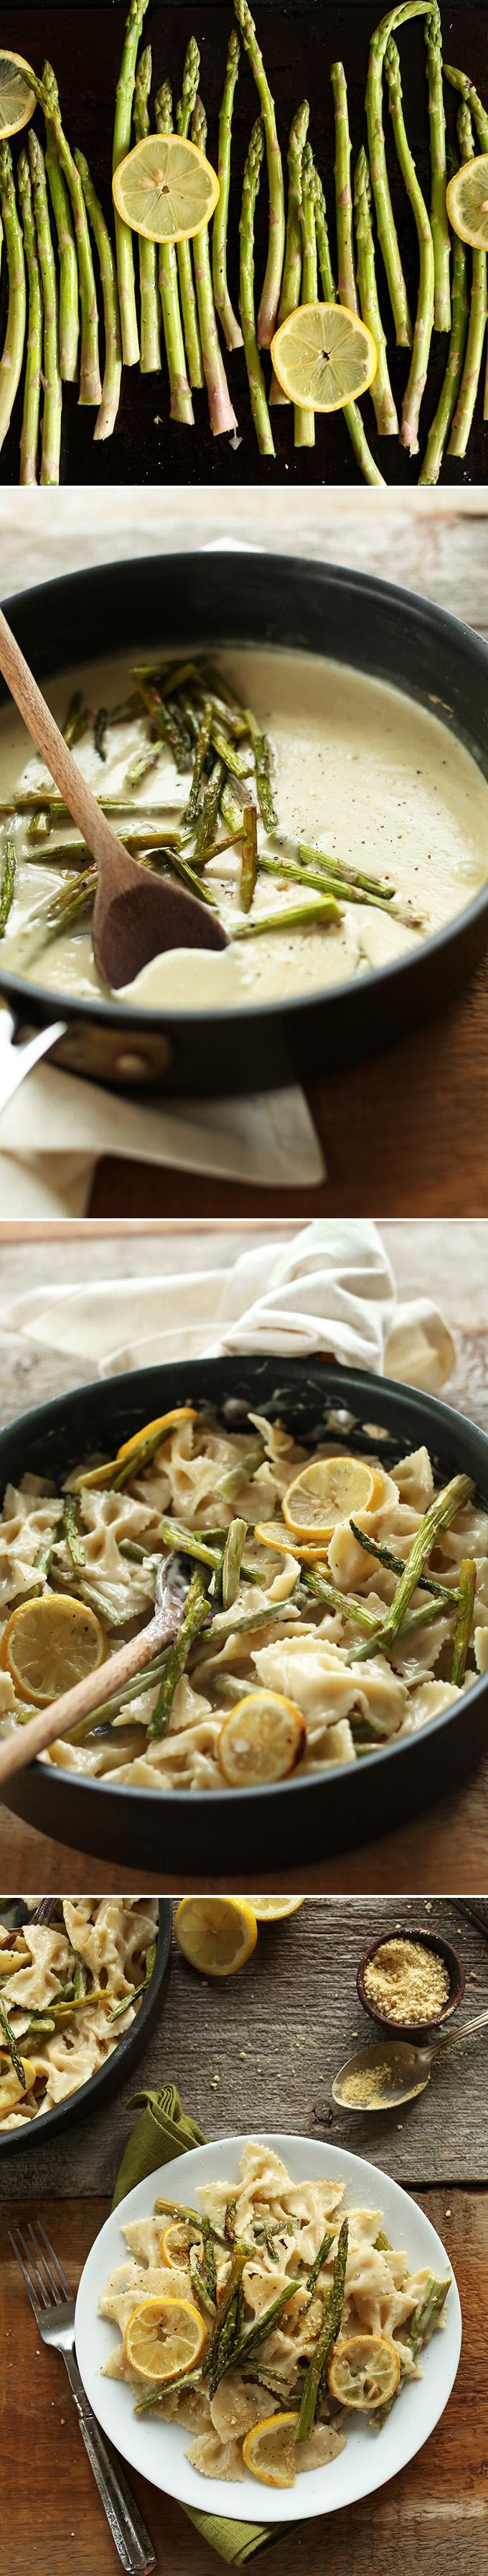 Vegan Lemon Asparagus Pasta! 30 minutes, 9 ingredients, SO creamy and delicious! #vegan #minimalistbaker